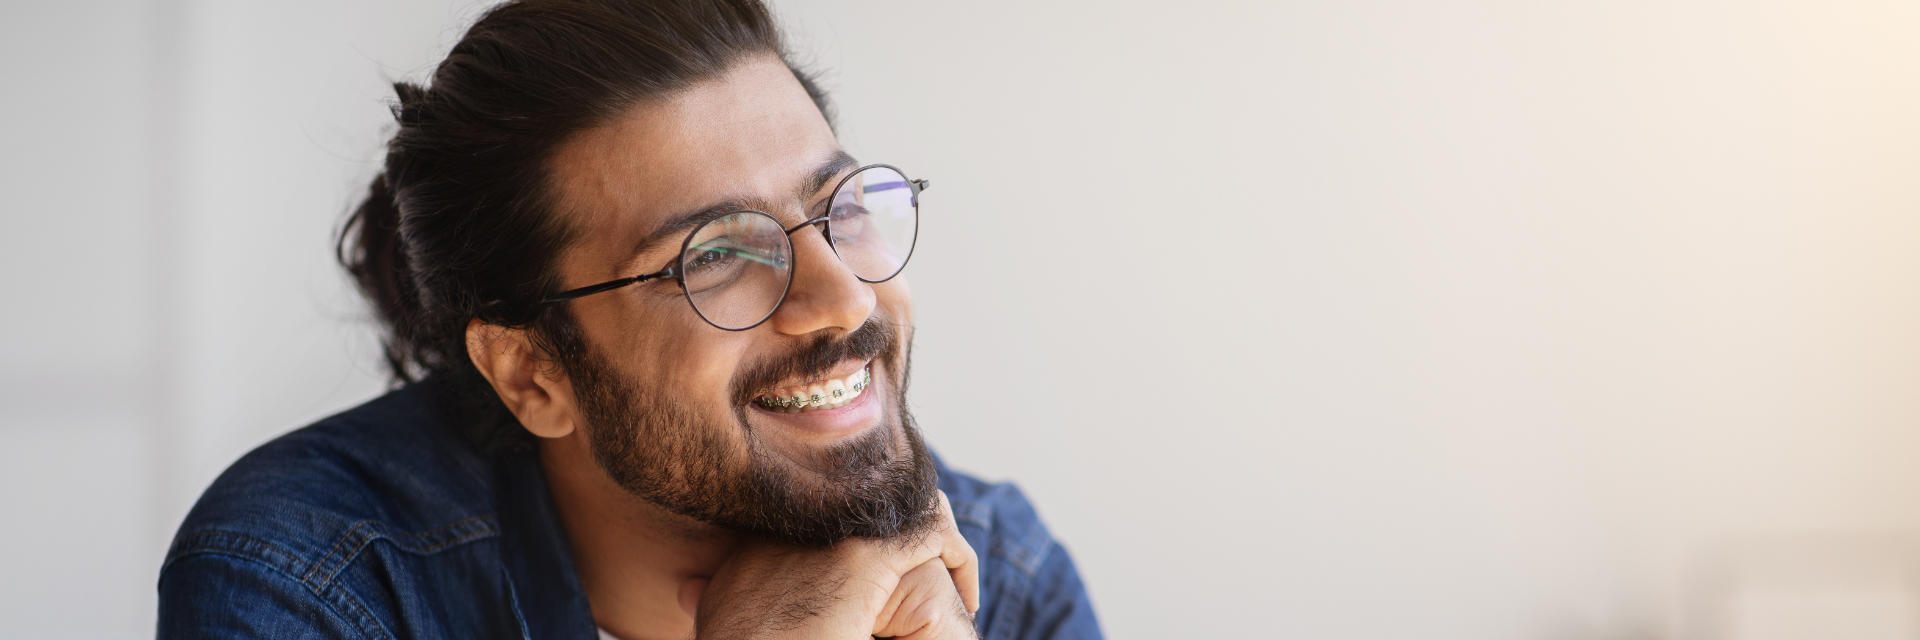 Smiling adult man wearing orthodontic braces.